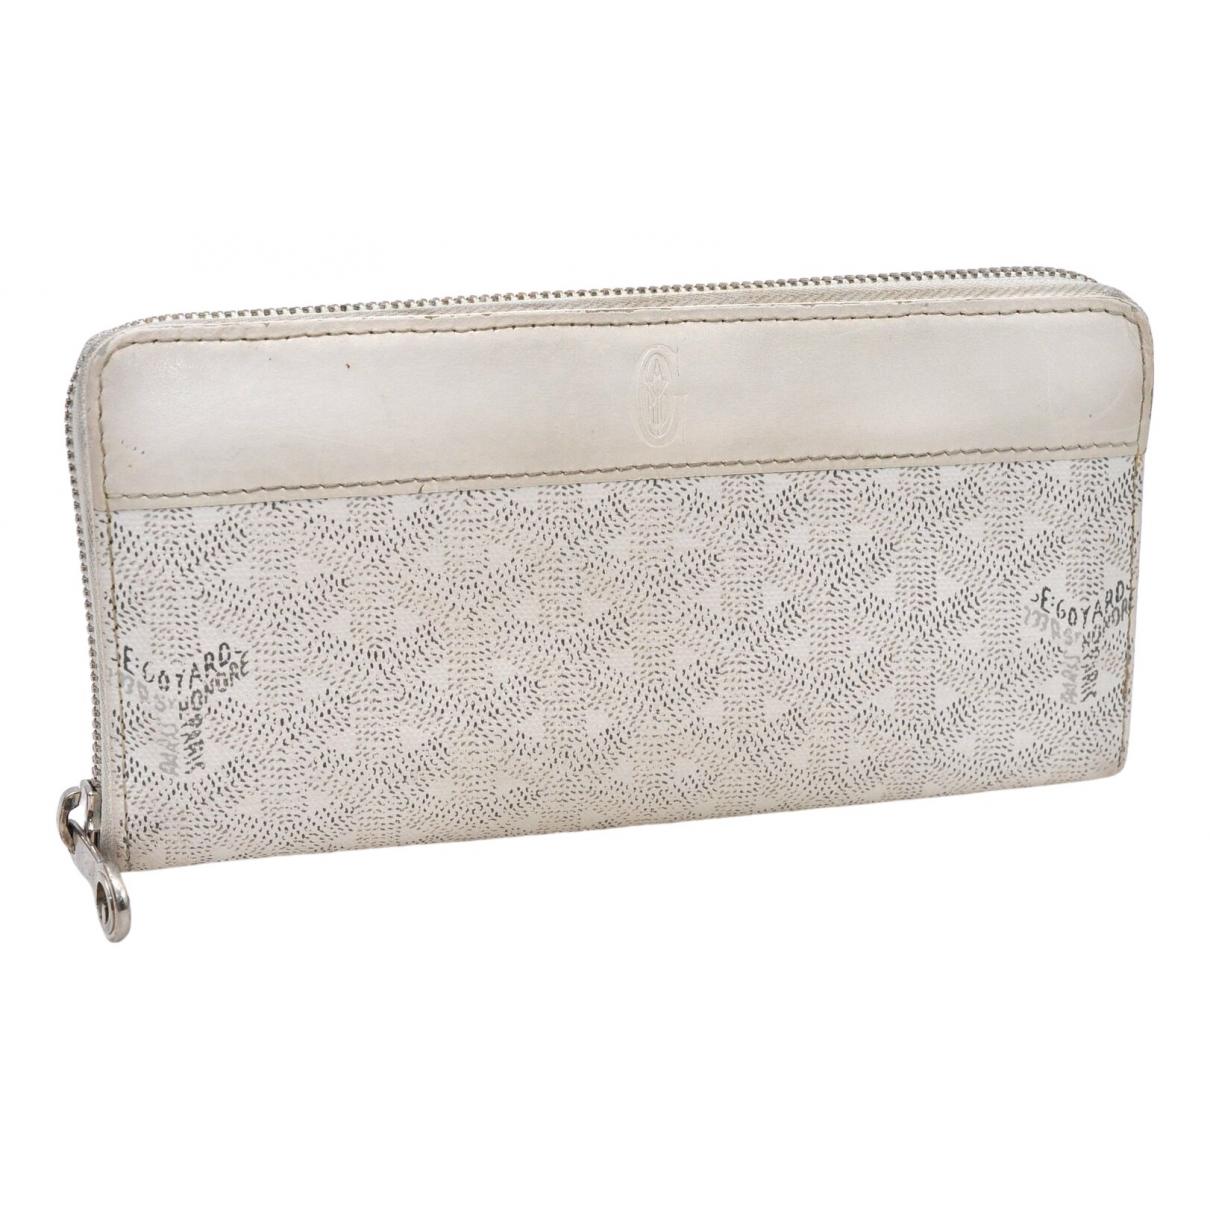 Goyard \N White wallet for Women \N